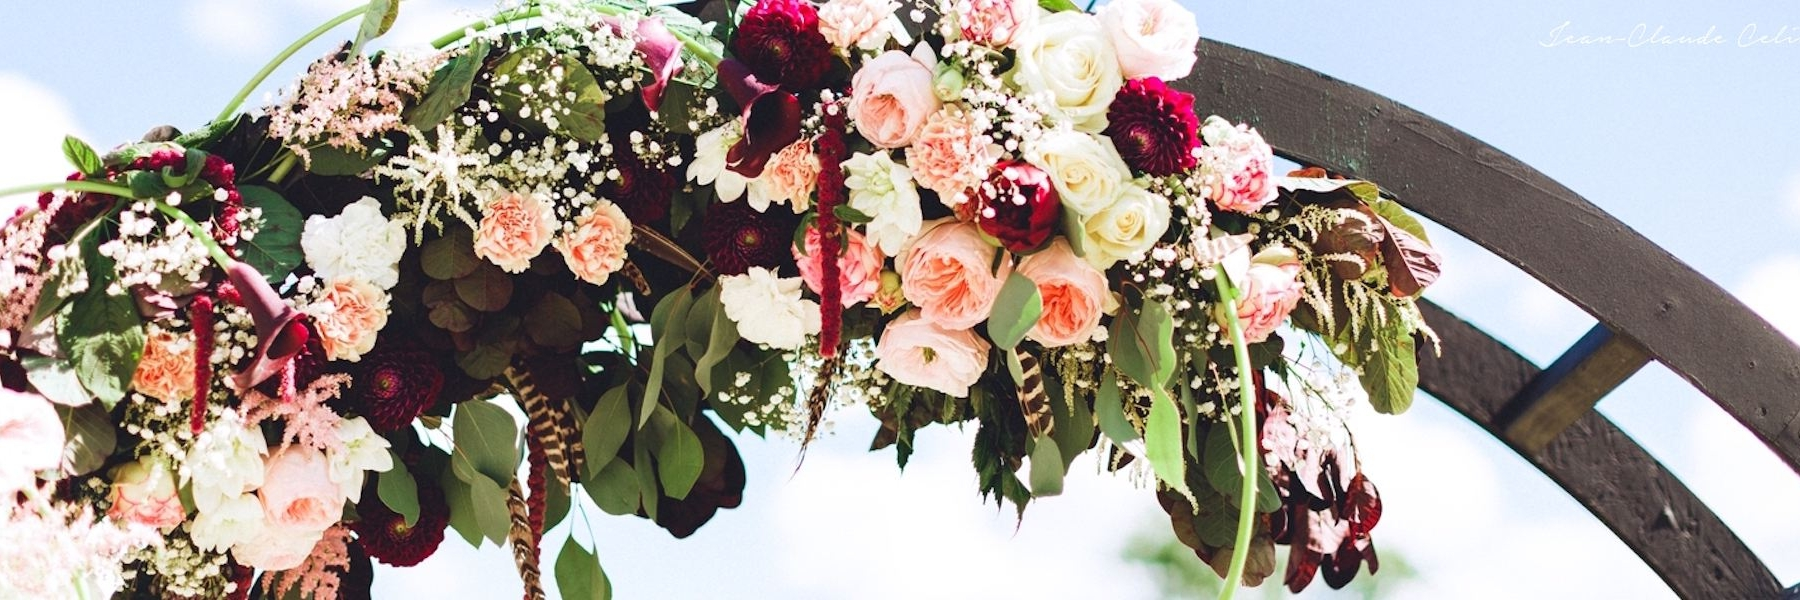 mariage-bordeau-burgundy